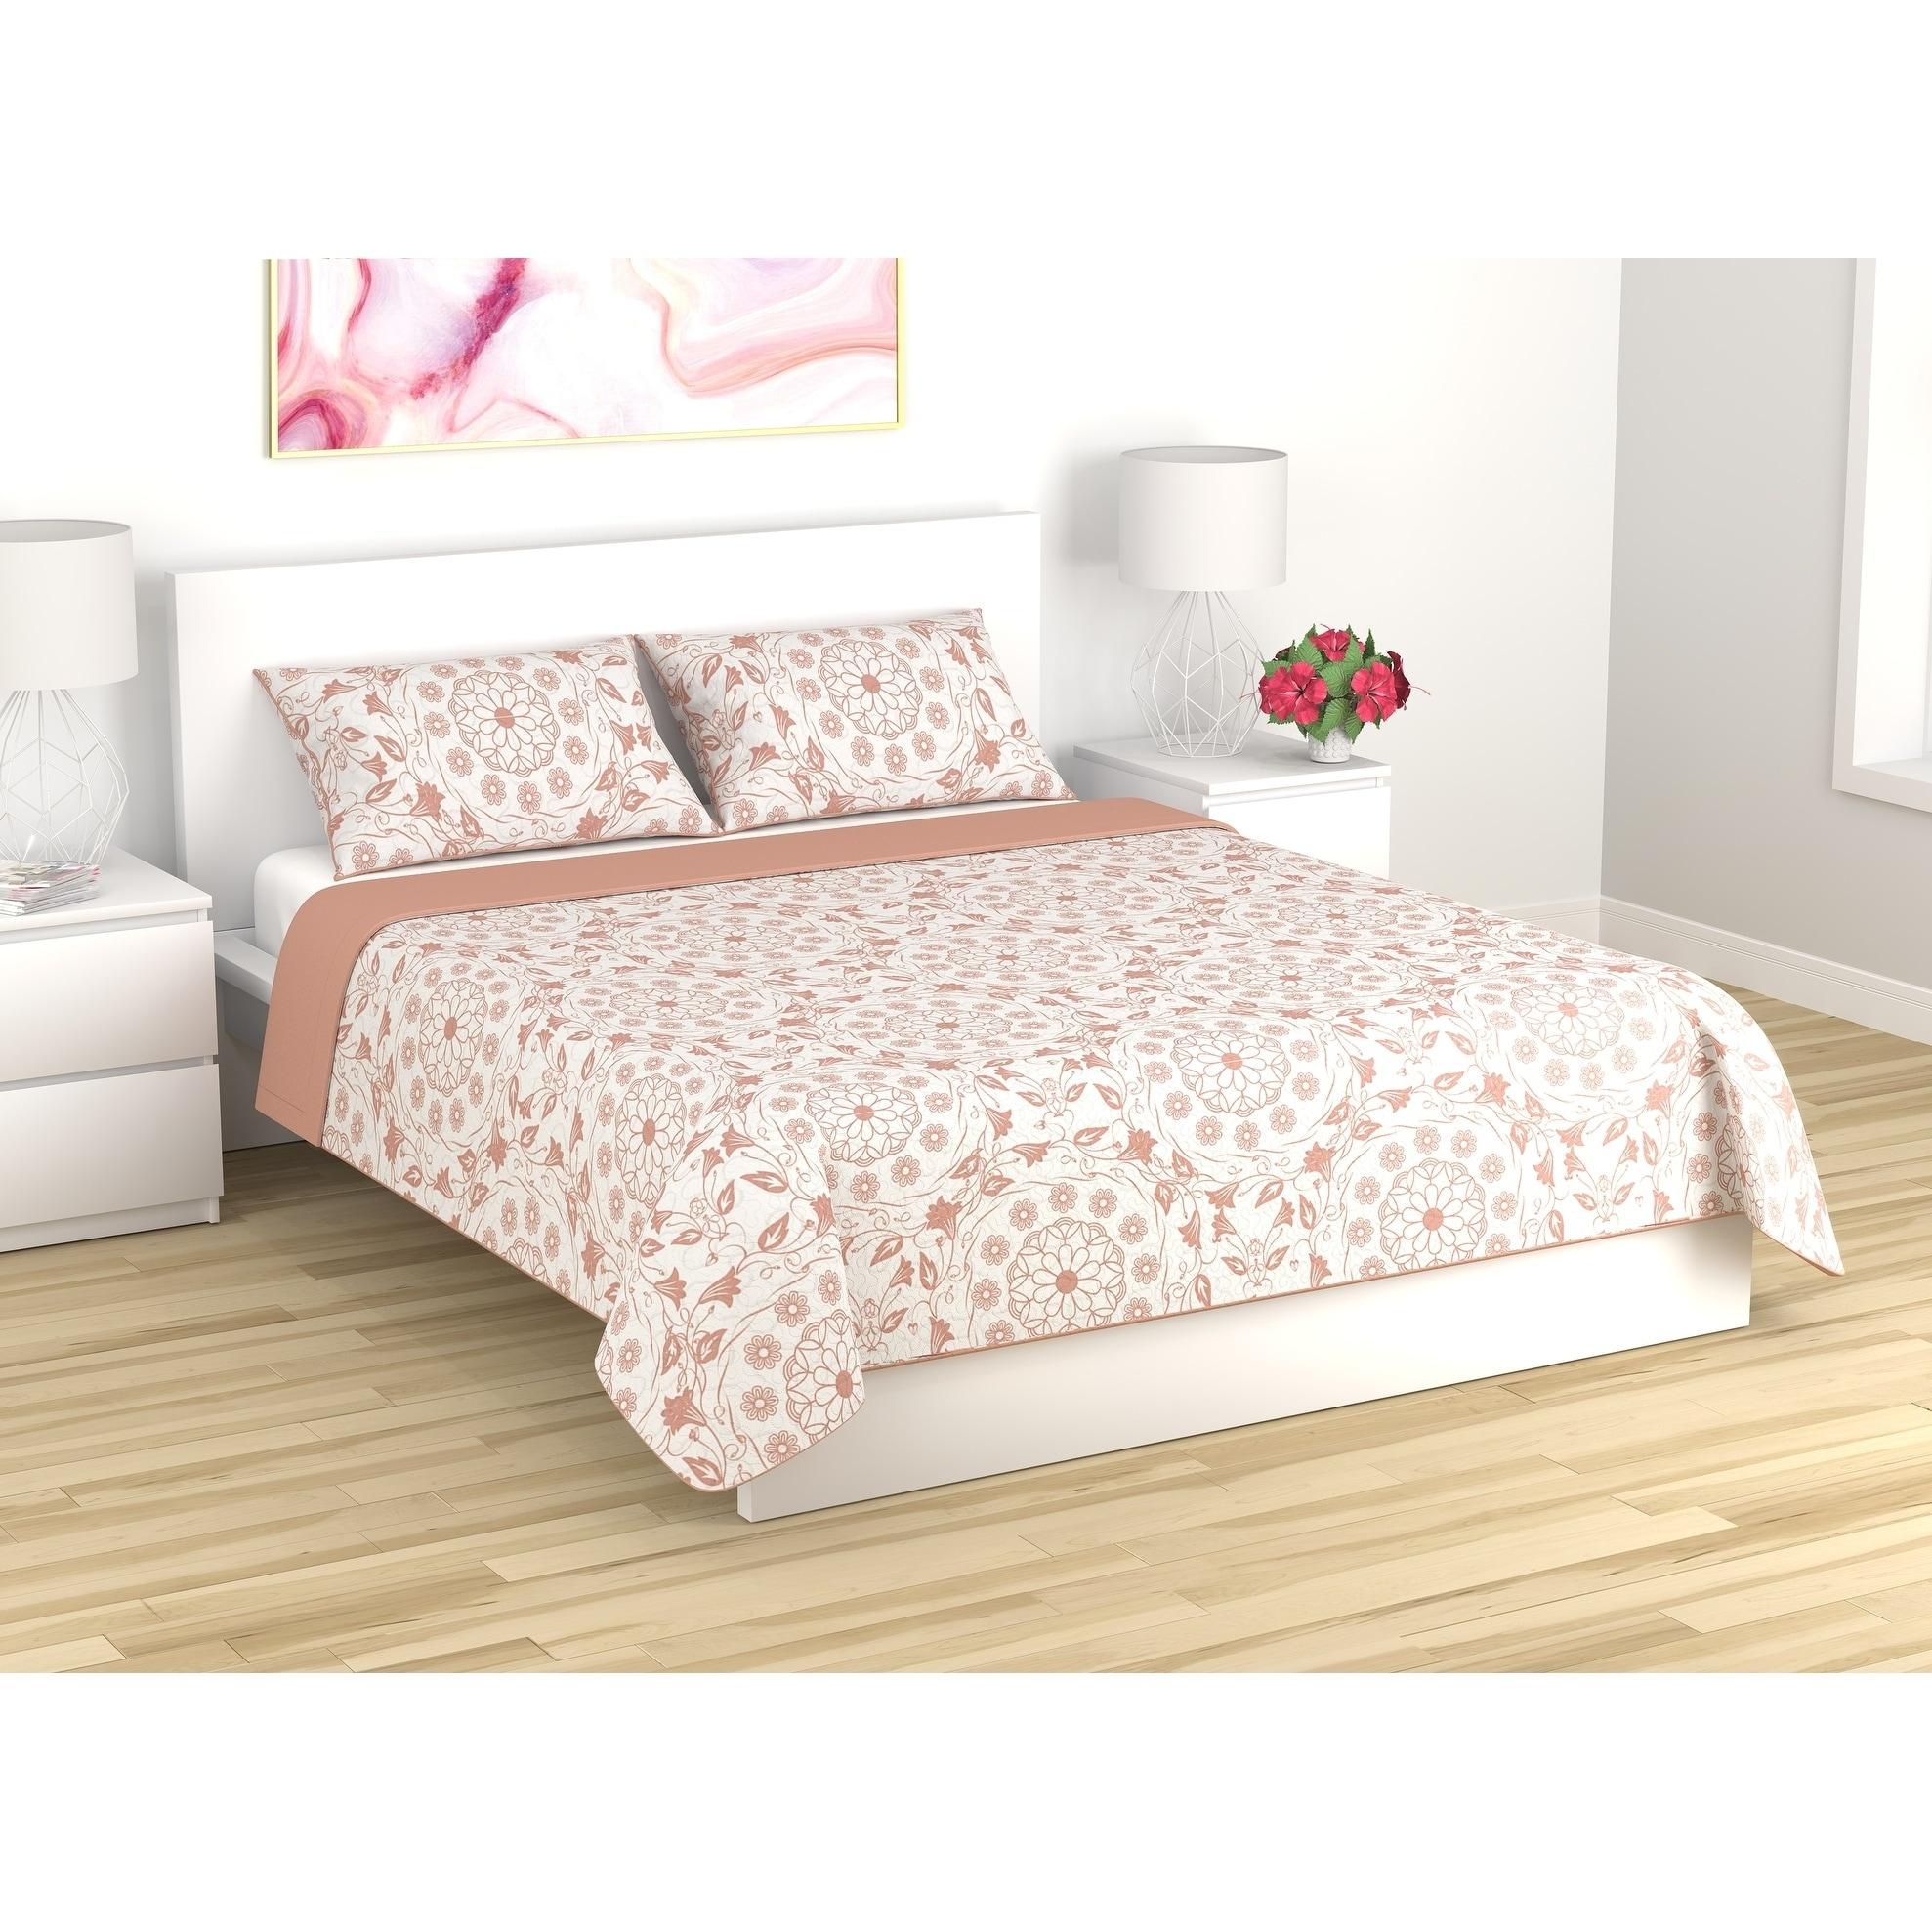 Shop Quilt Blanket 3 Piece Set King Mandala Coral Cloud Overstock 26980809